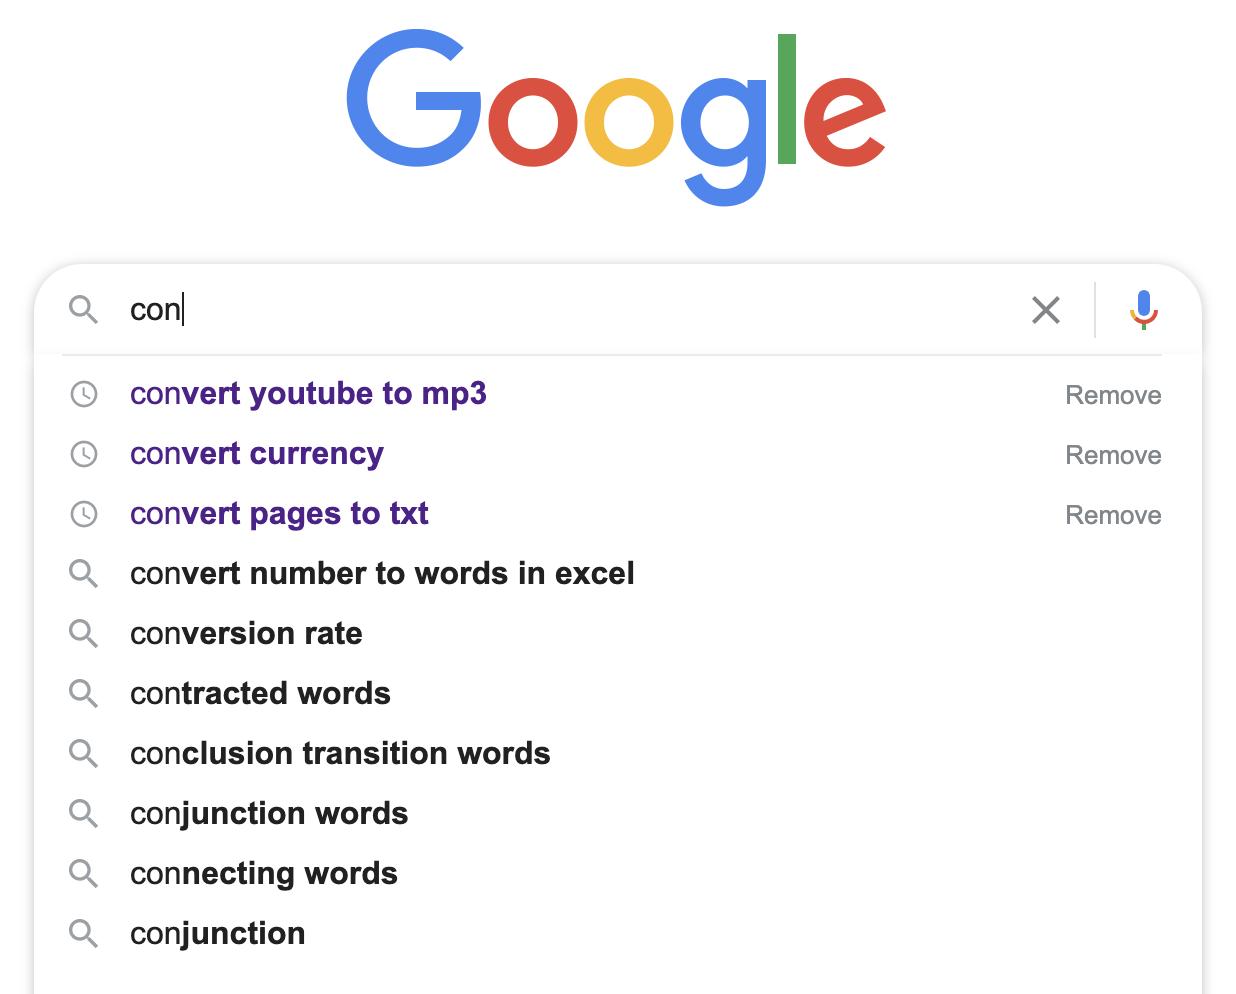 iamautocomplete: influence google suggest